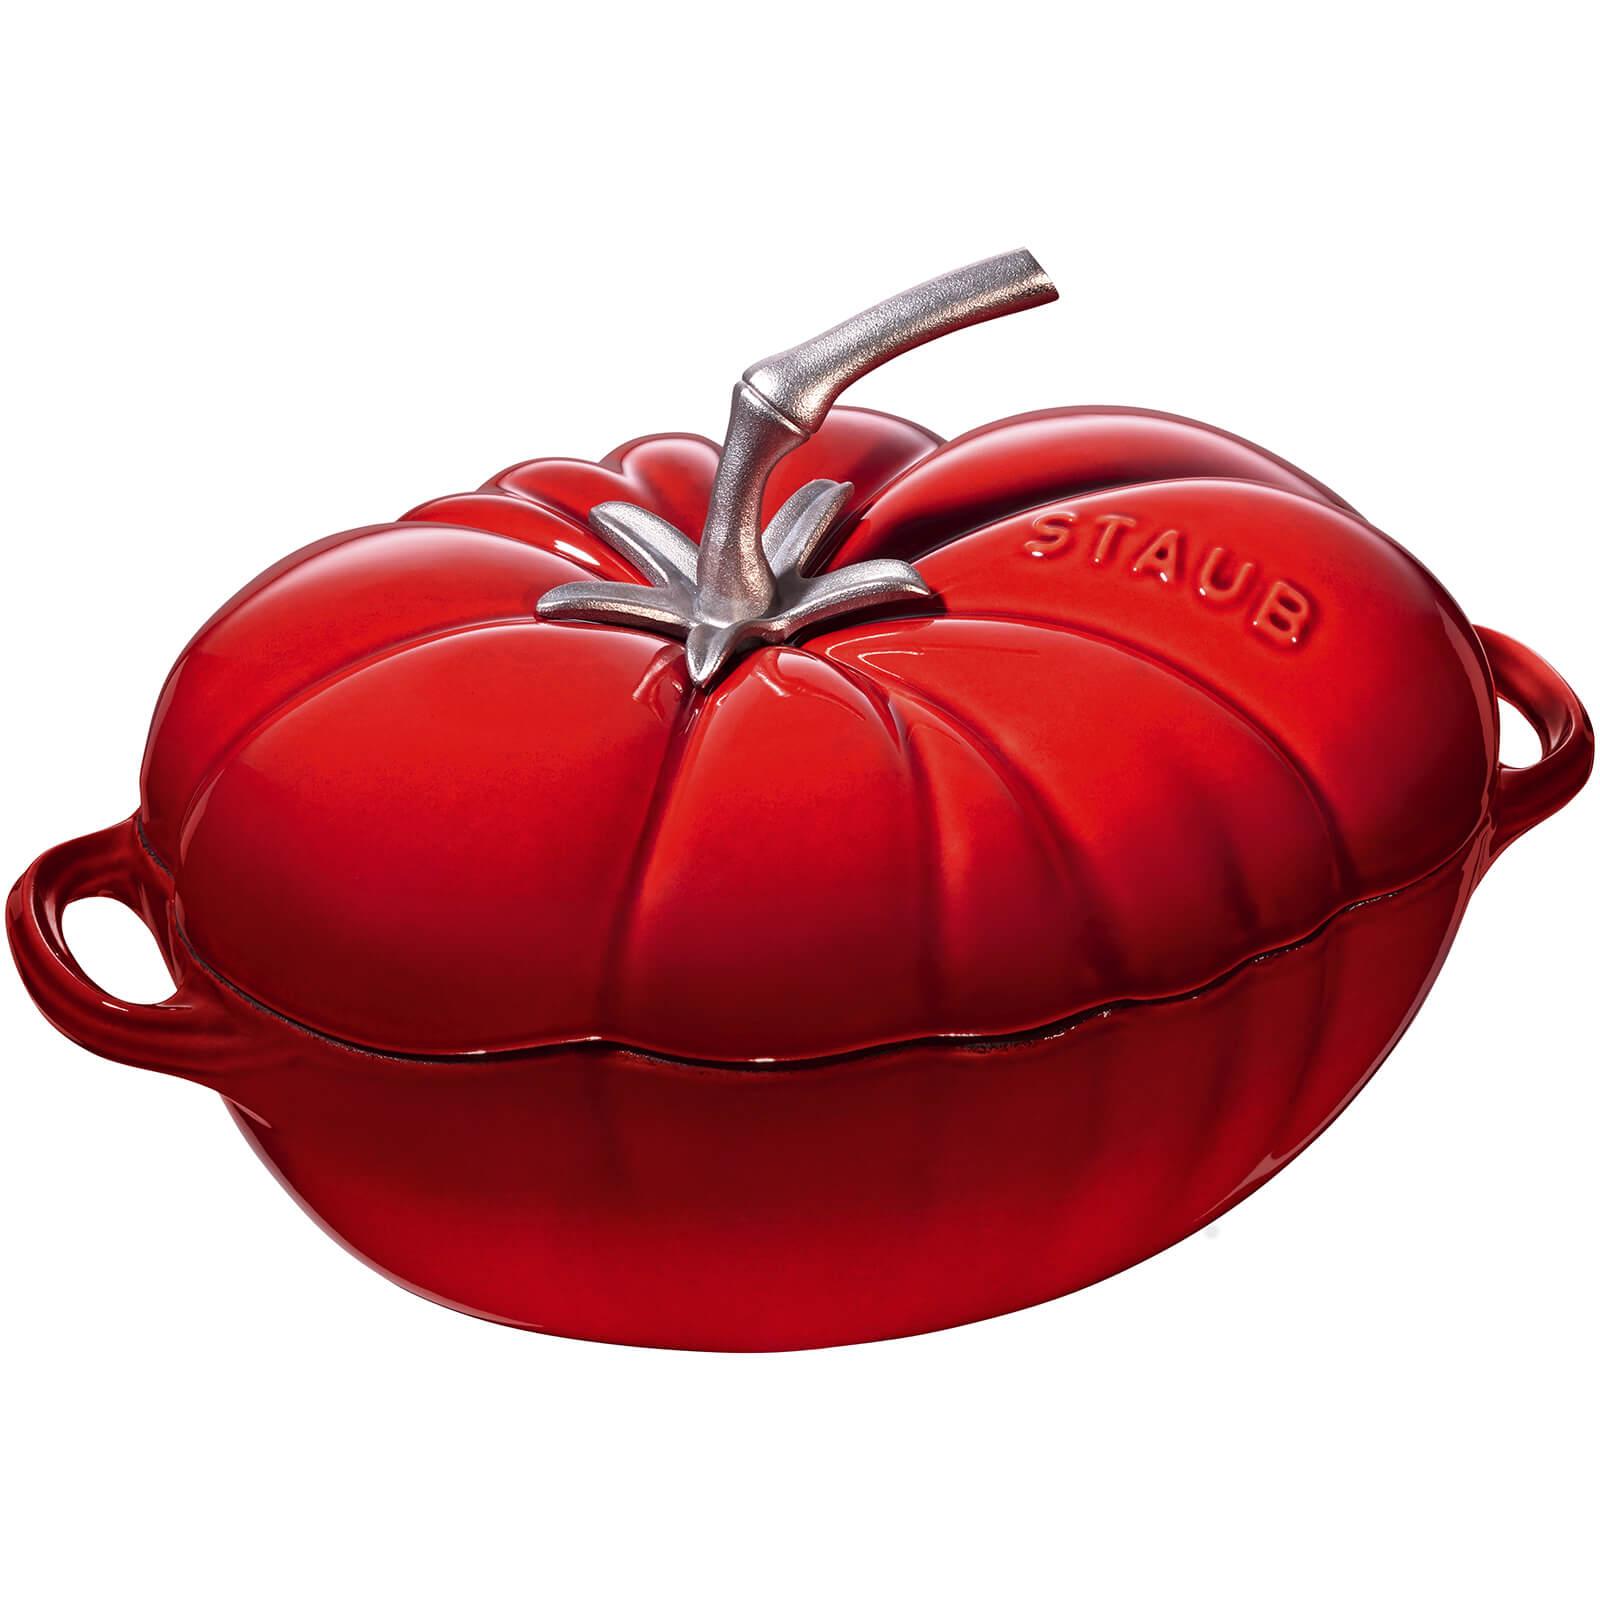 Staub Oval Tomato Cocotte - Cherry - 25cm